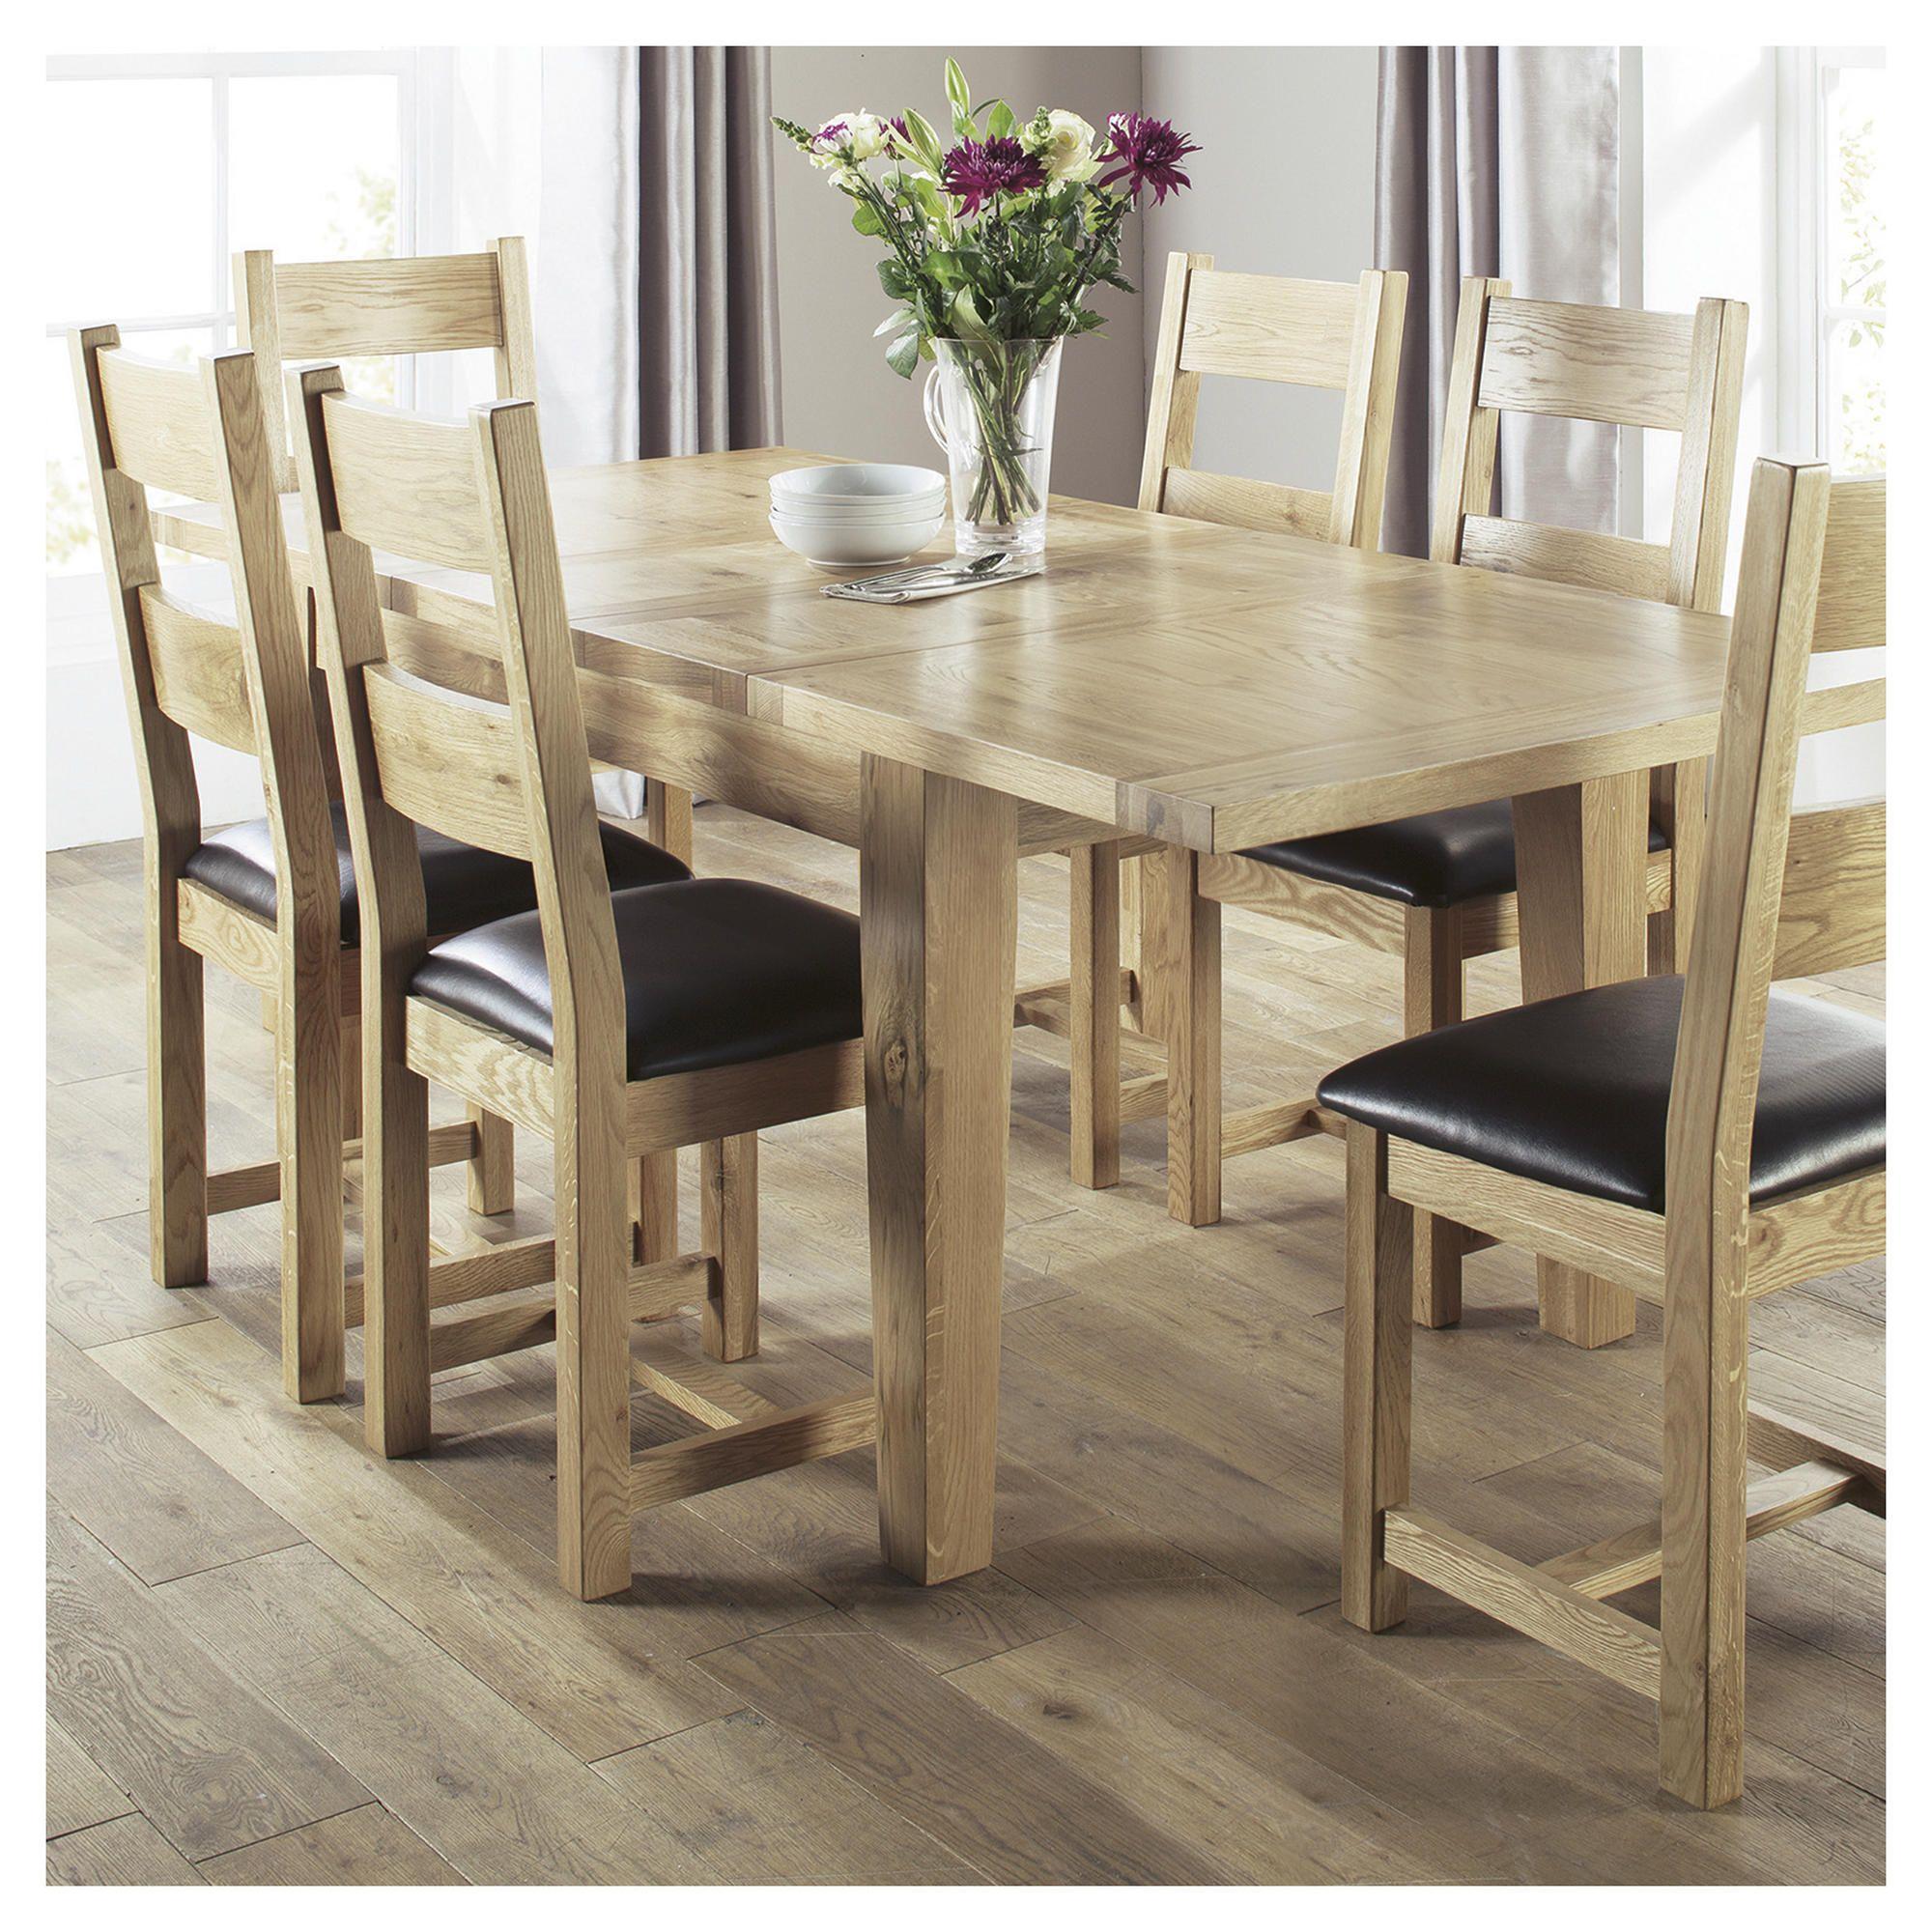 Tesco Java Dining Table